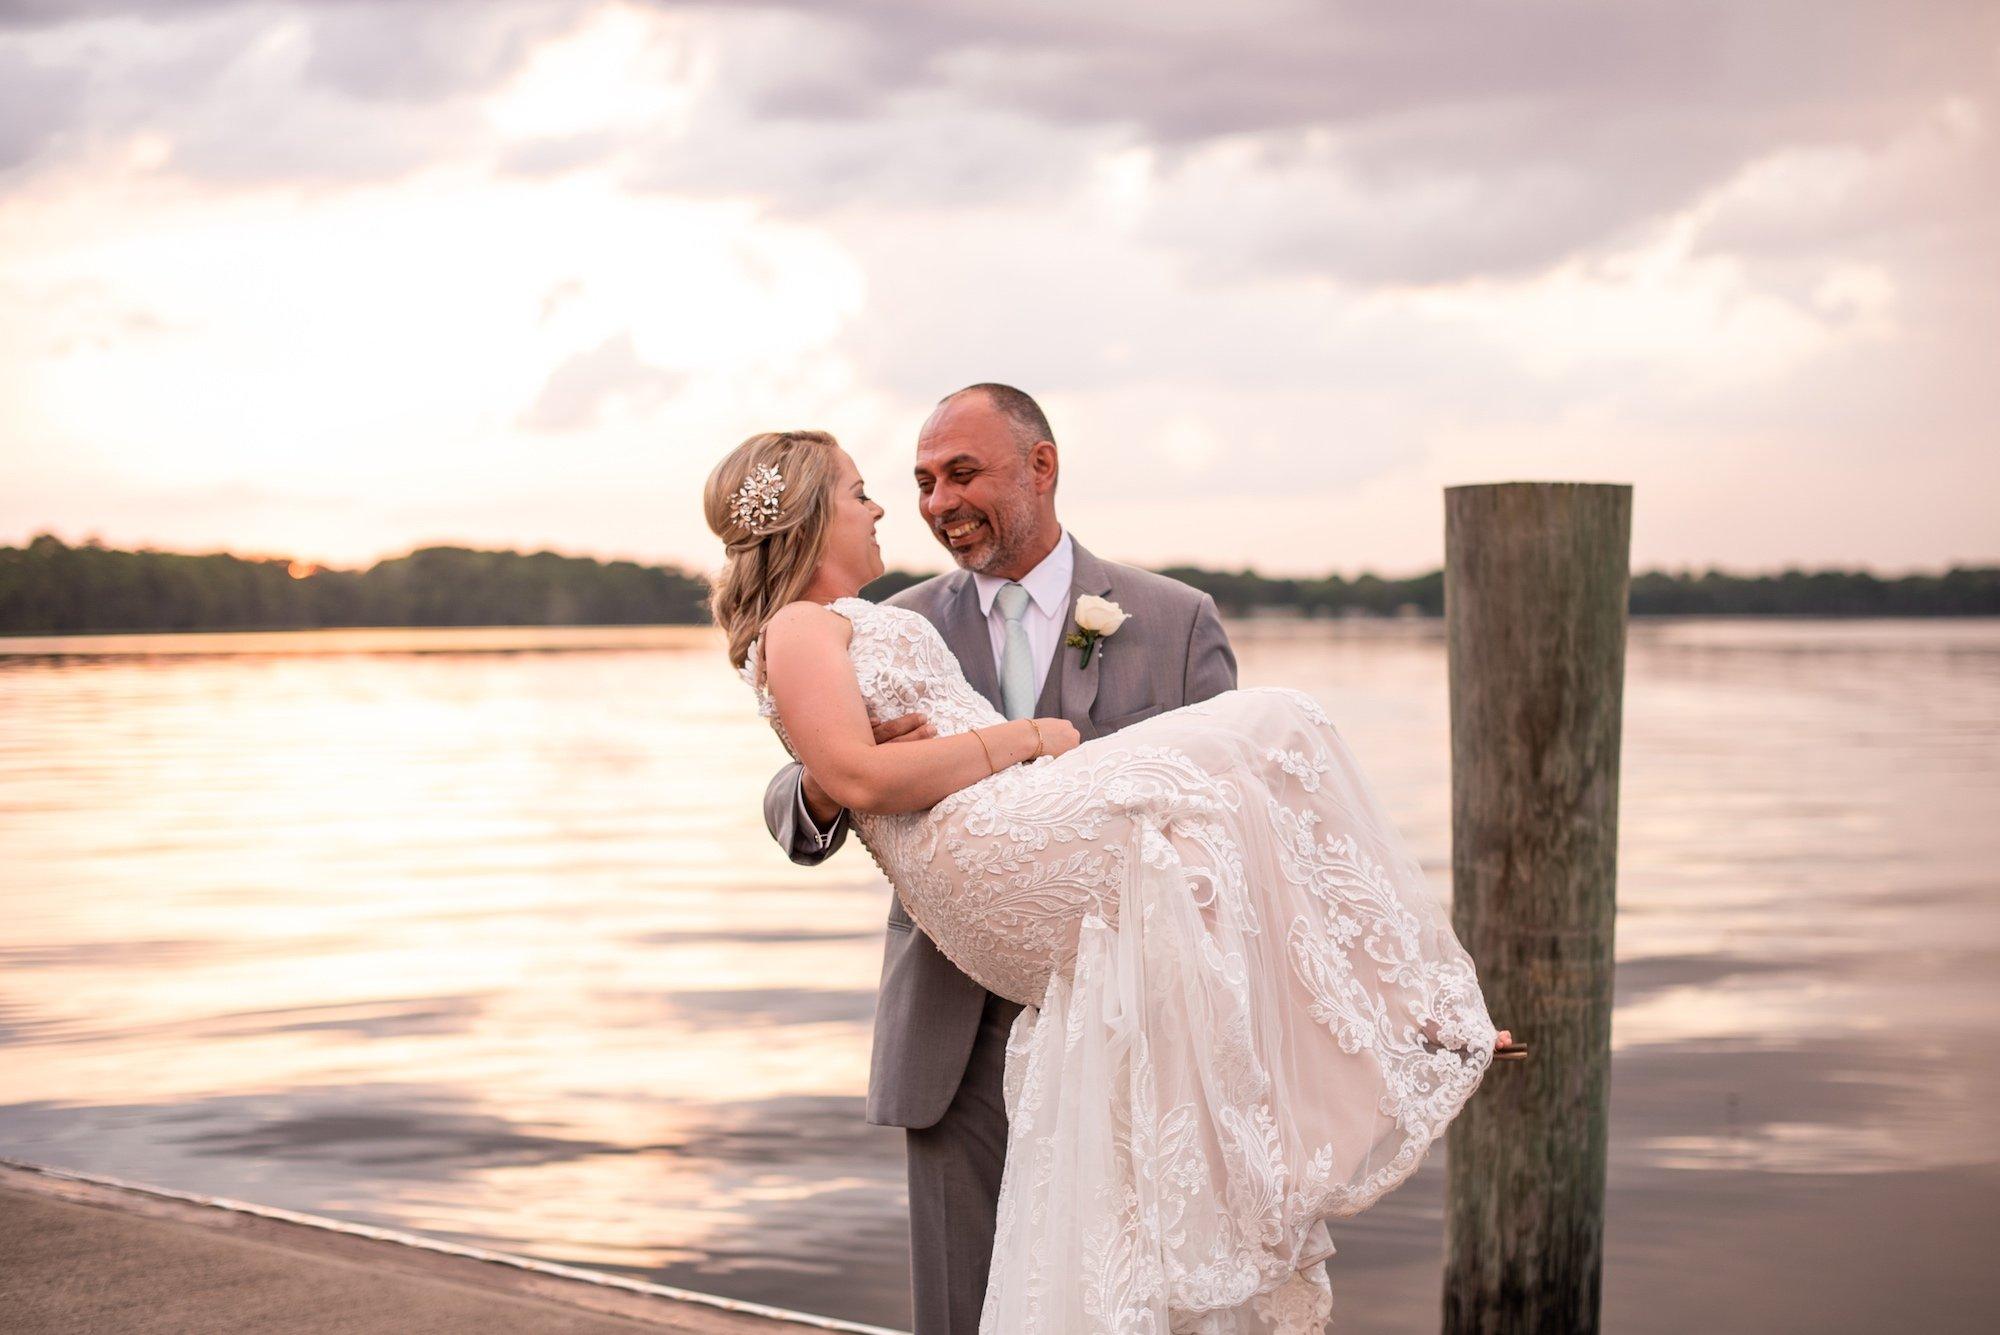 15 Best Lakefront Wedding Venues in the US